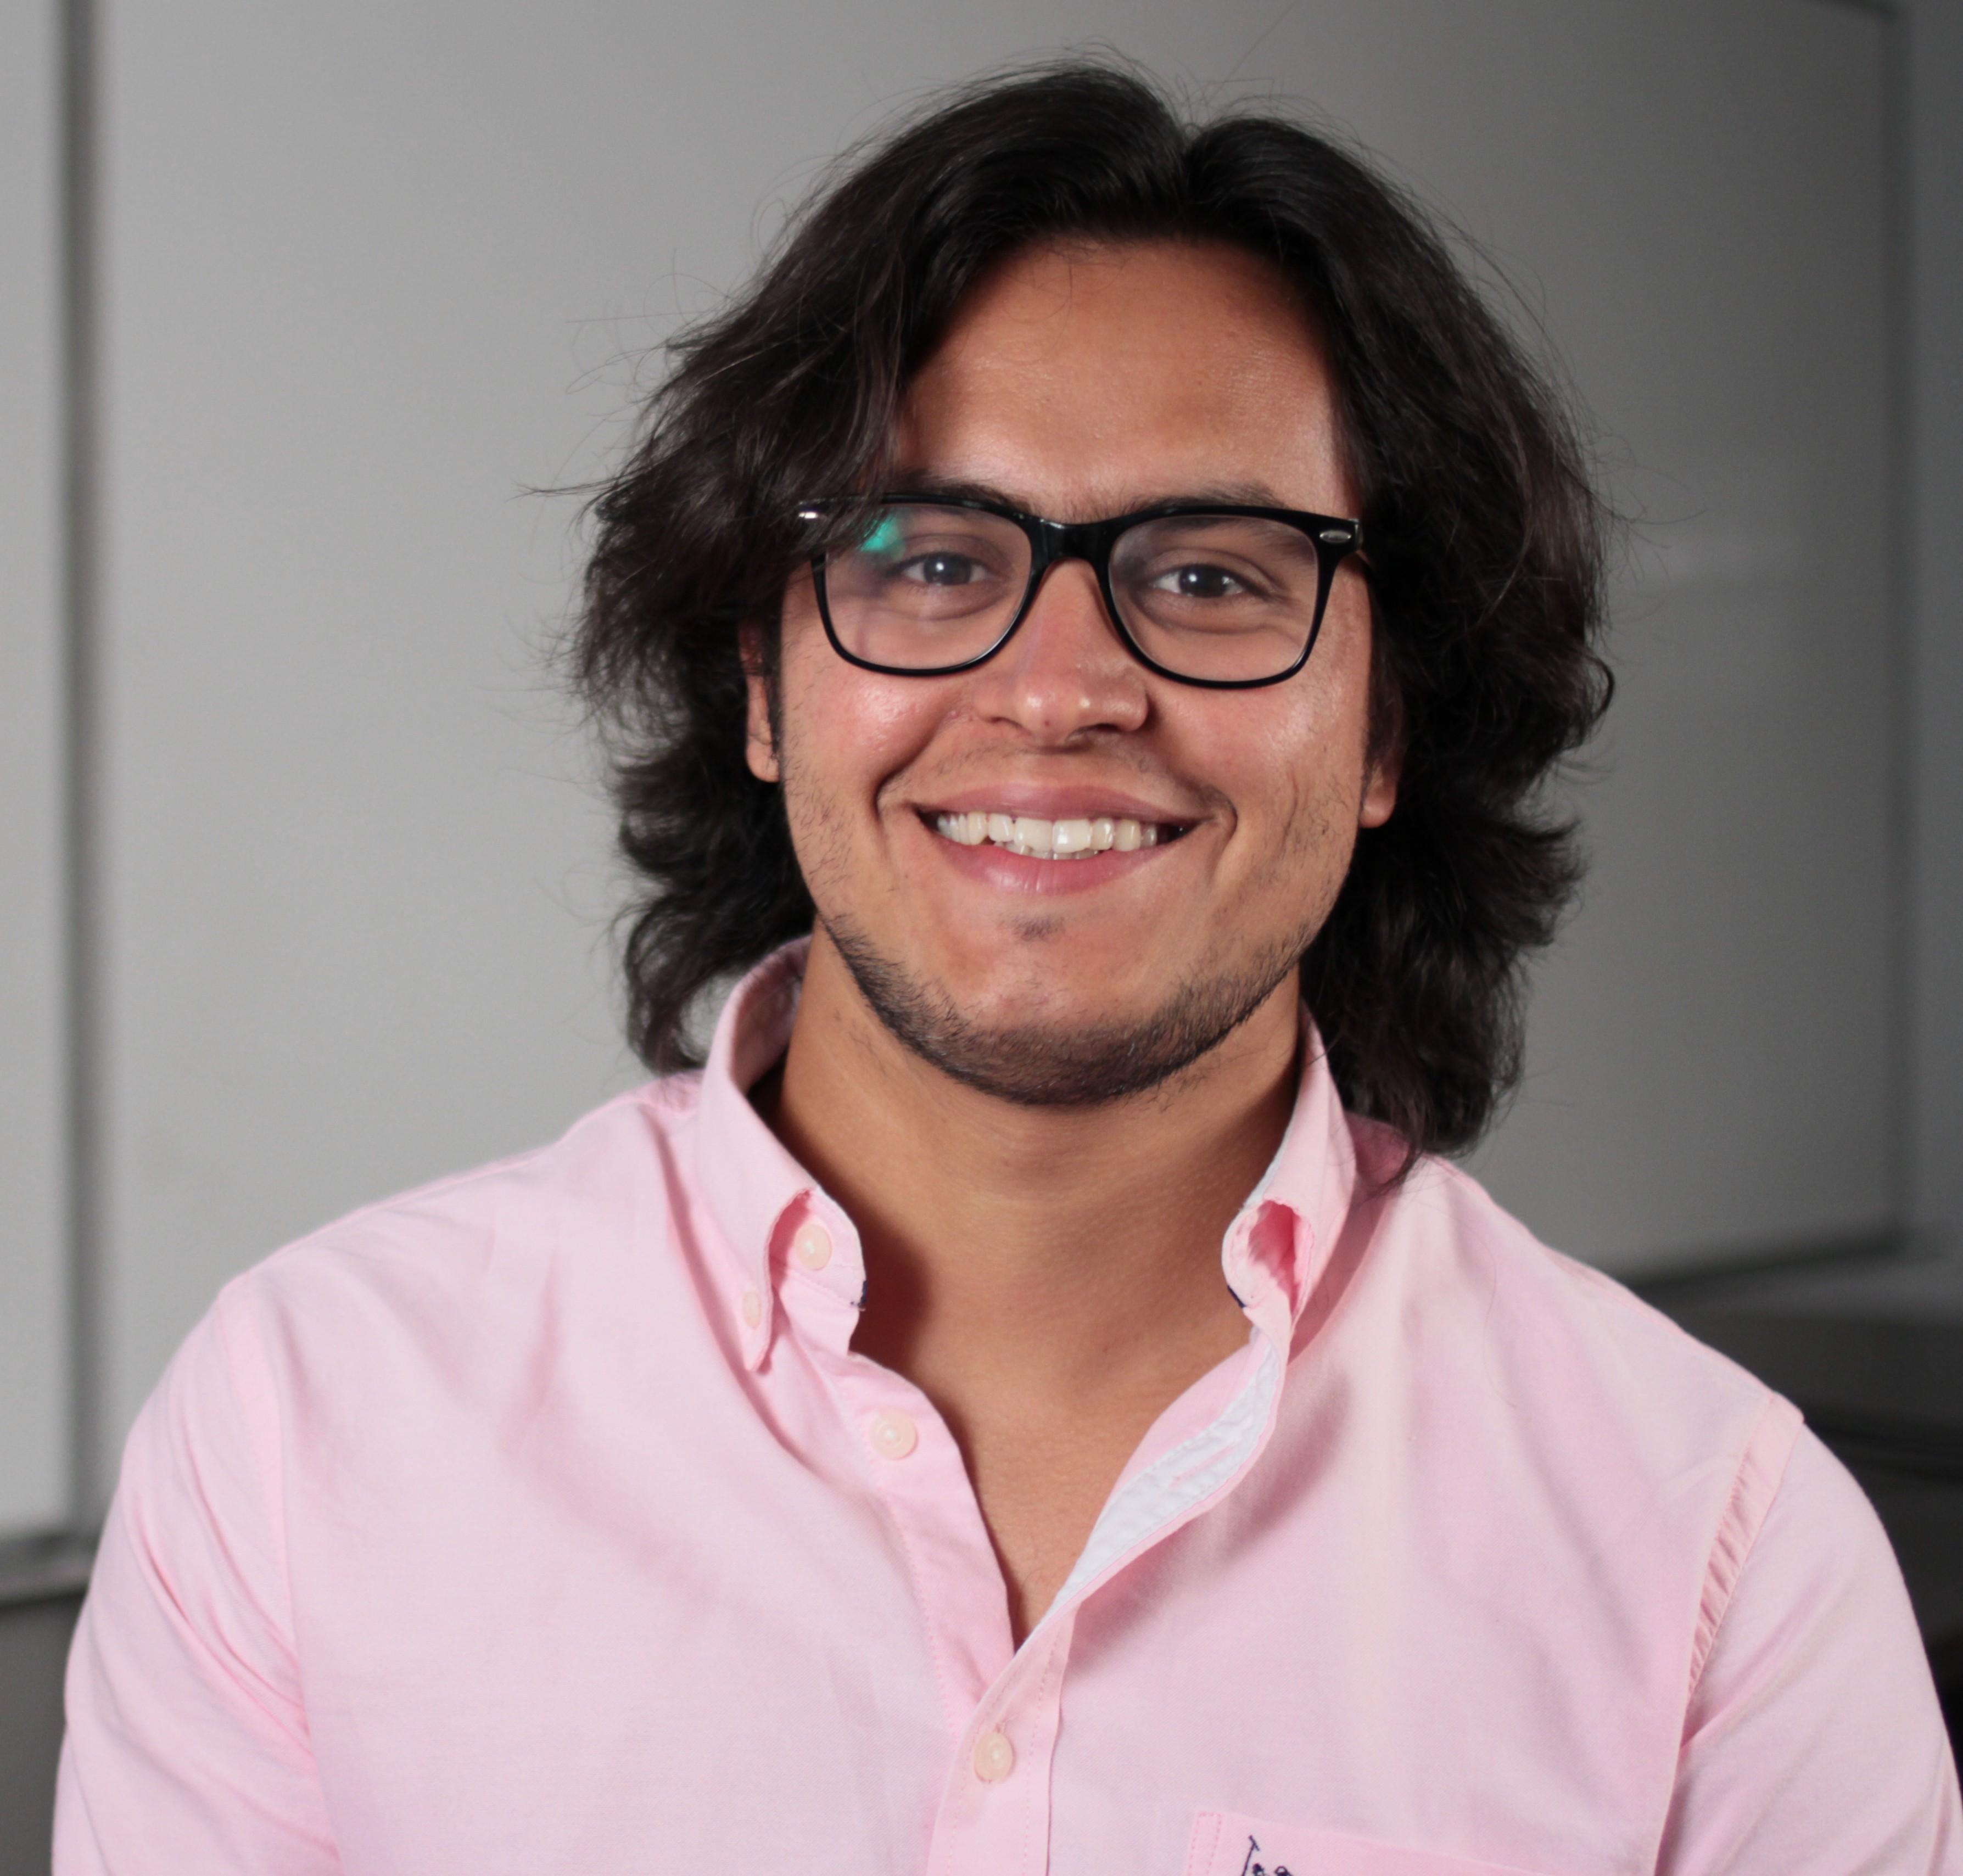 Team member portrait - Amit Panghal